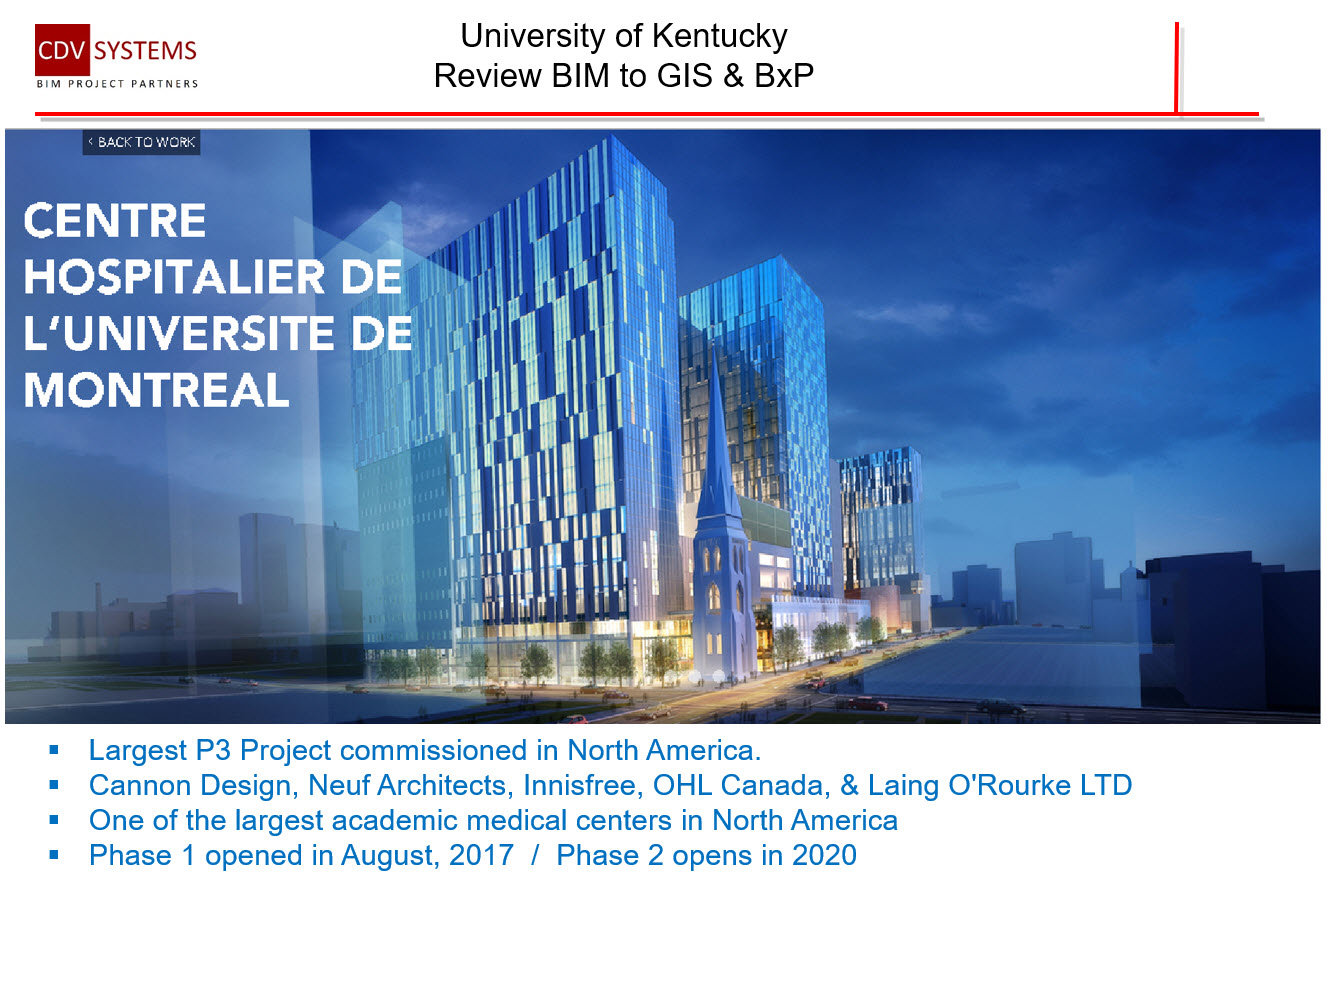 University of Kentucky_001q.jpg